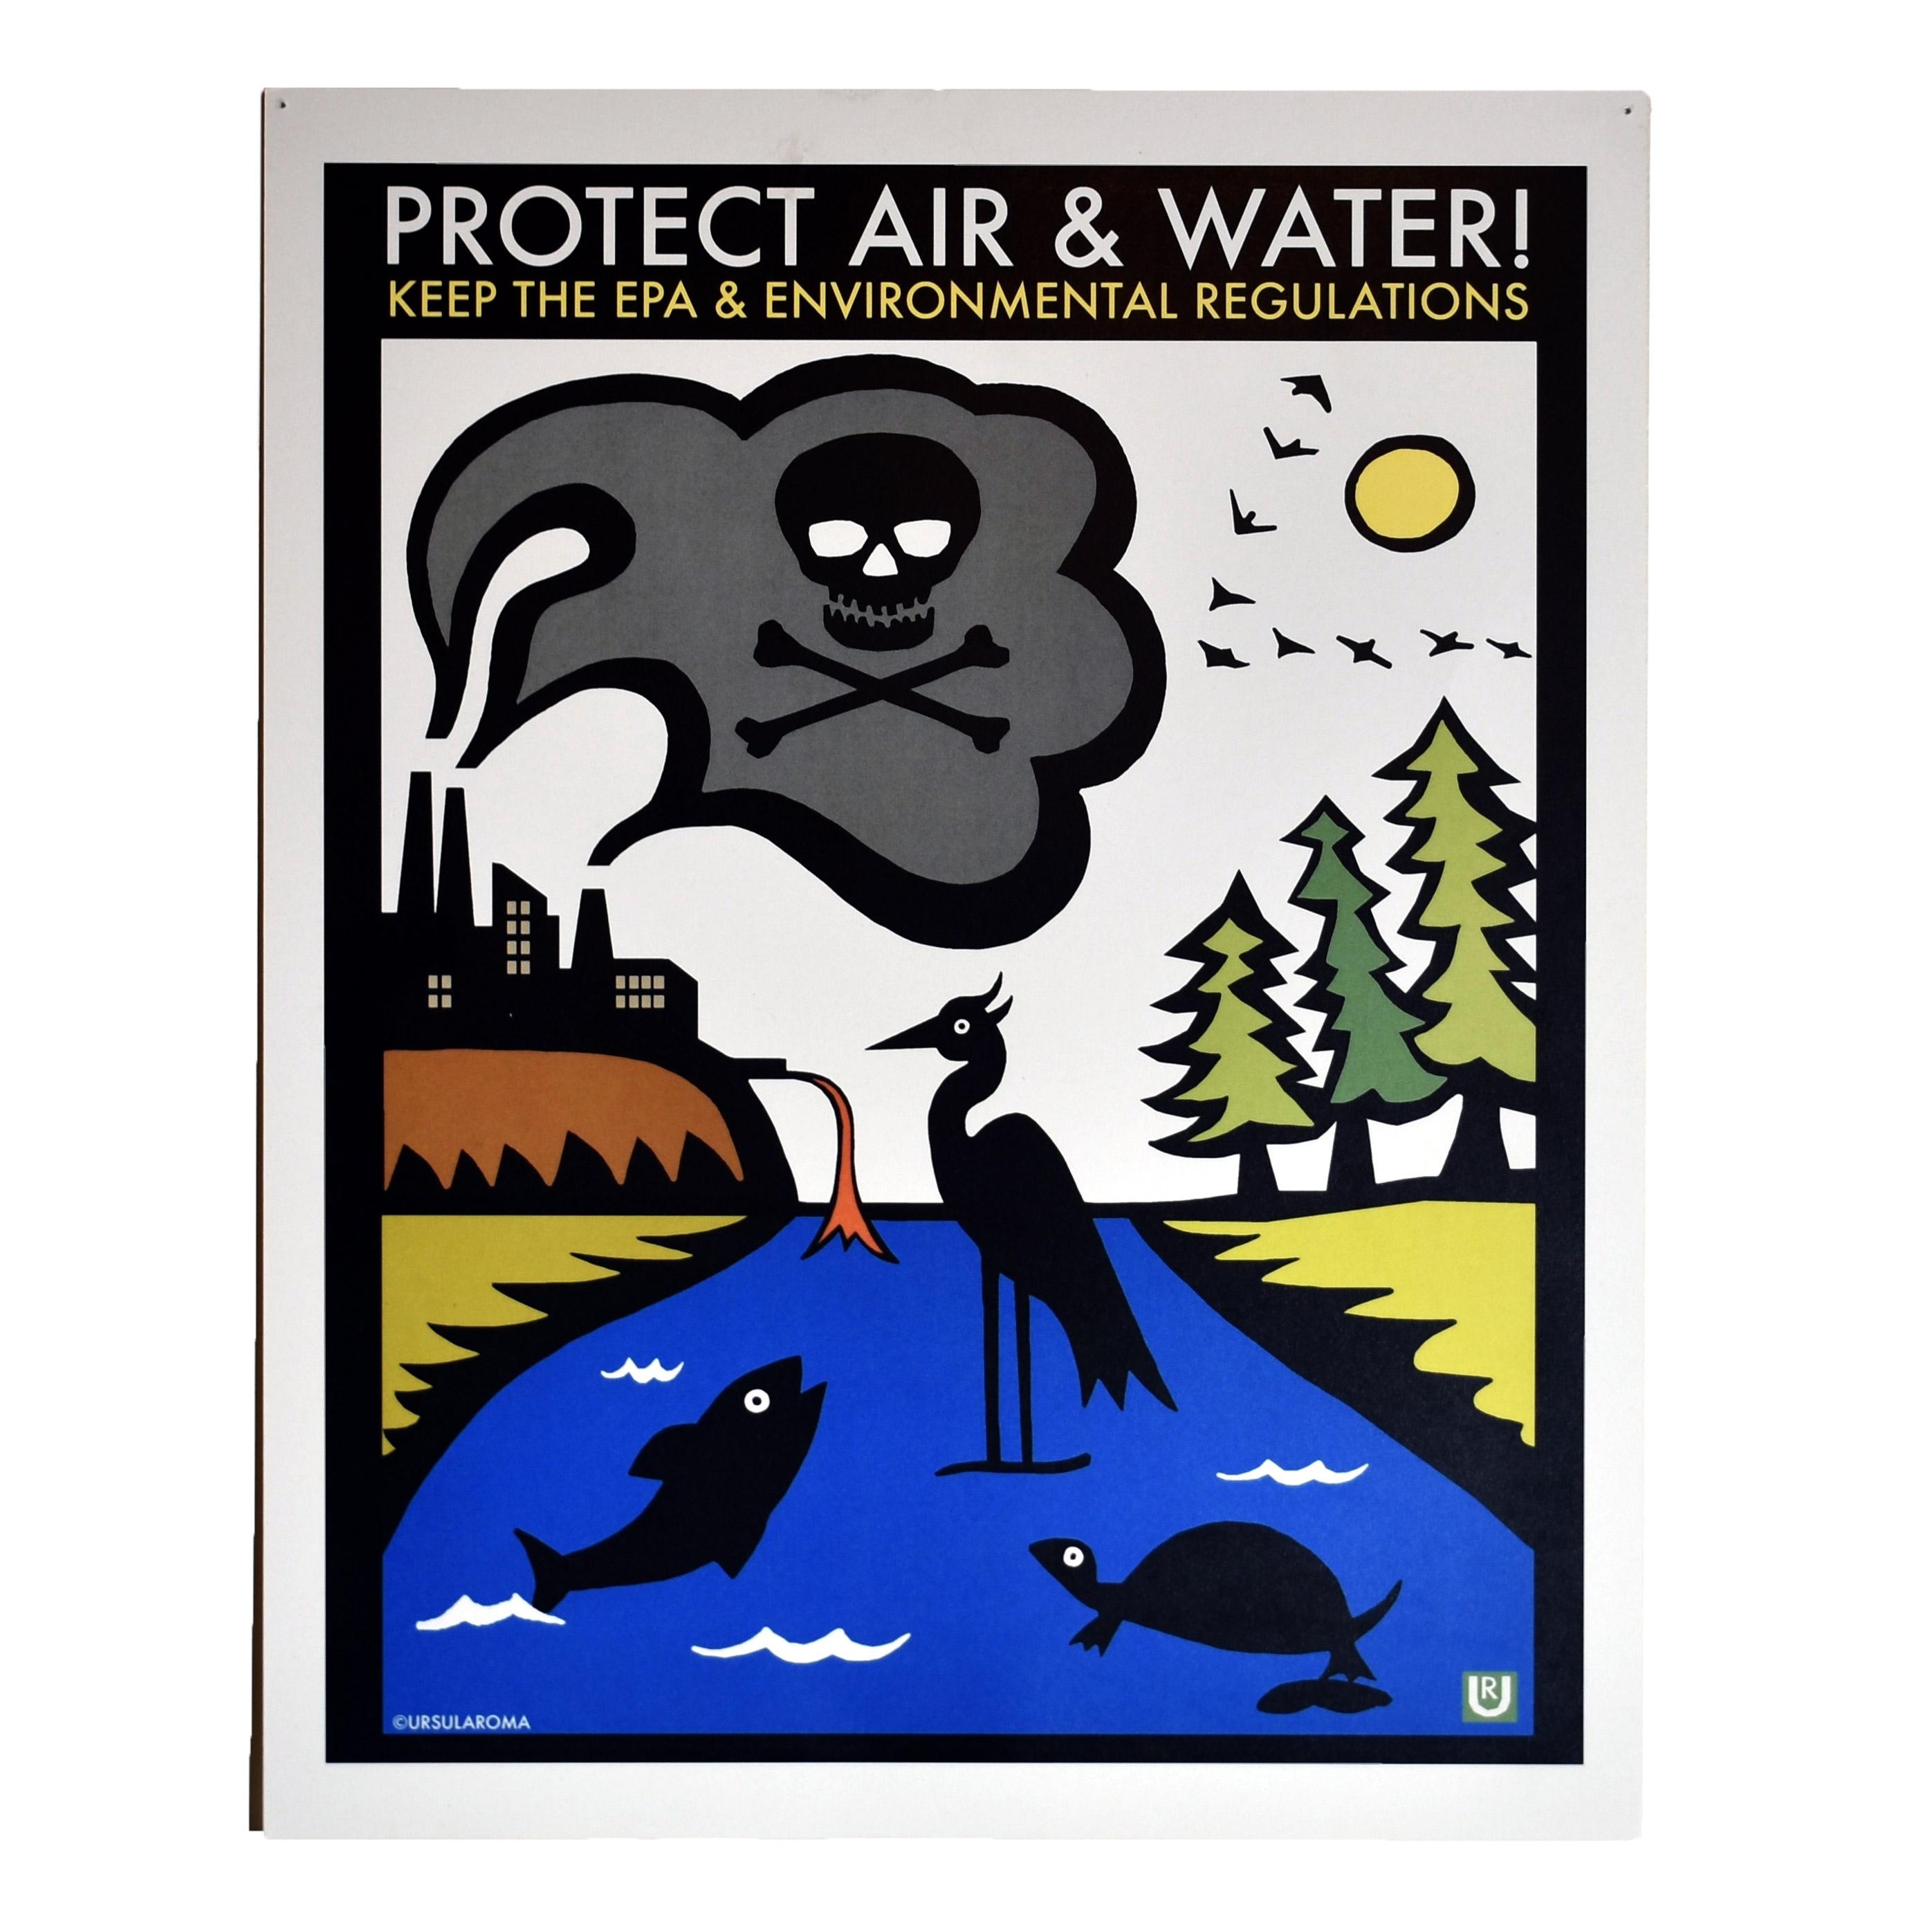 Protect air & water! Keep the EPA & environmental regulations